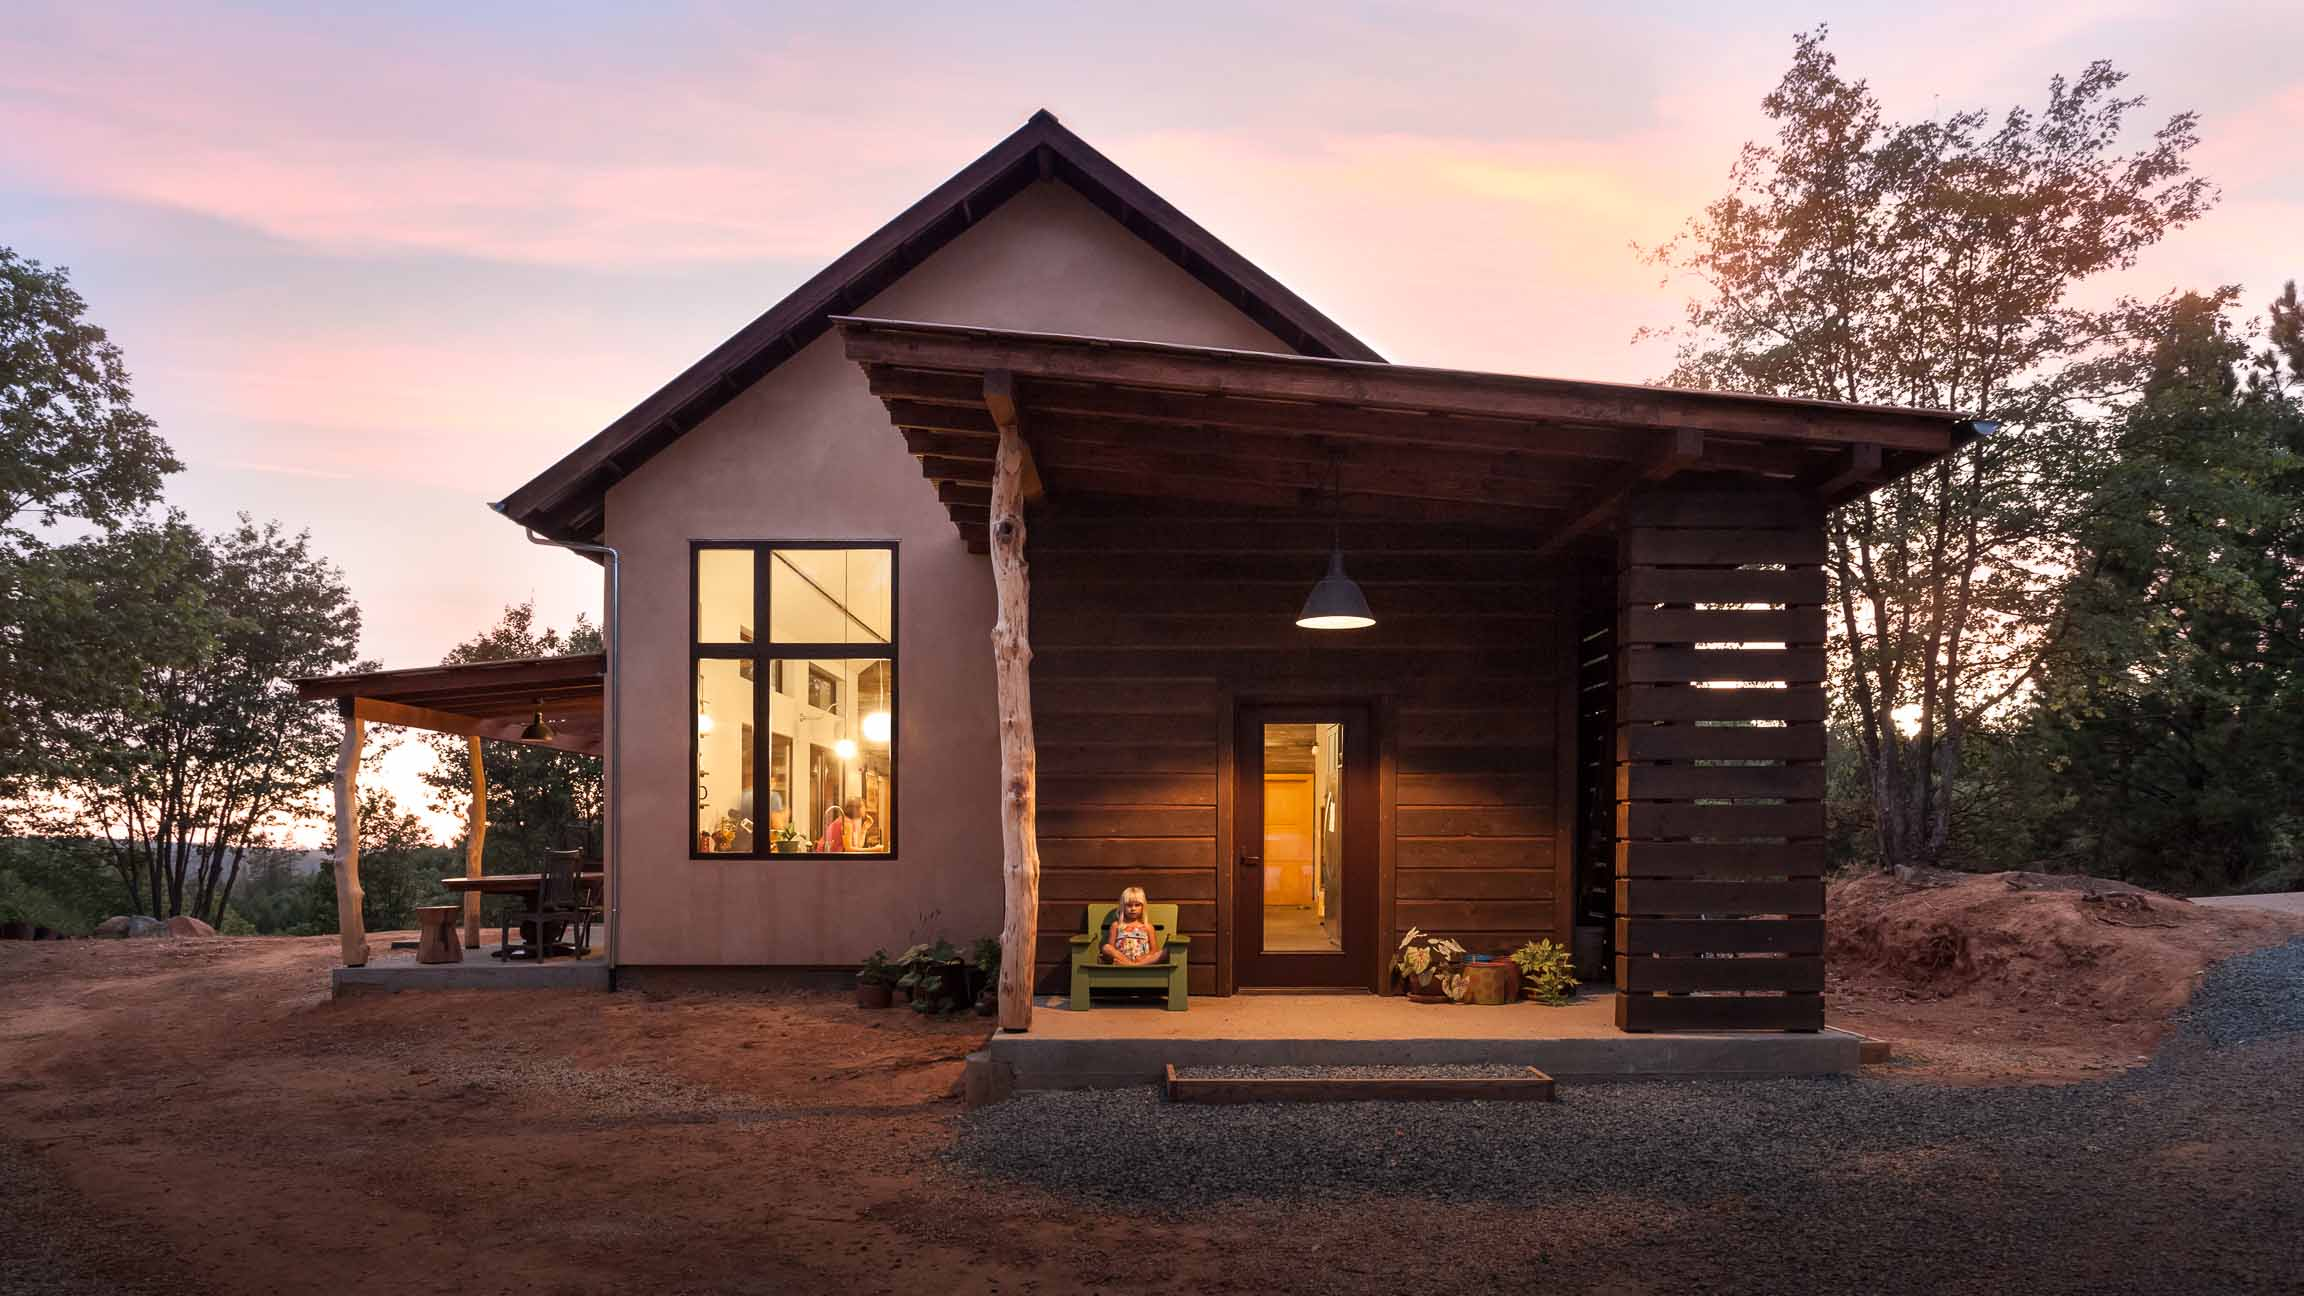 Net-zero home in California